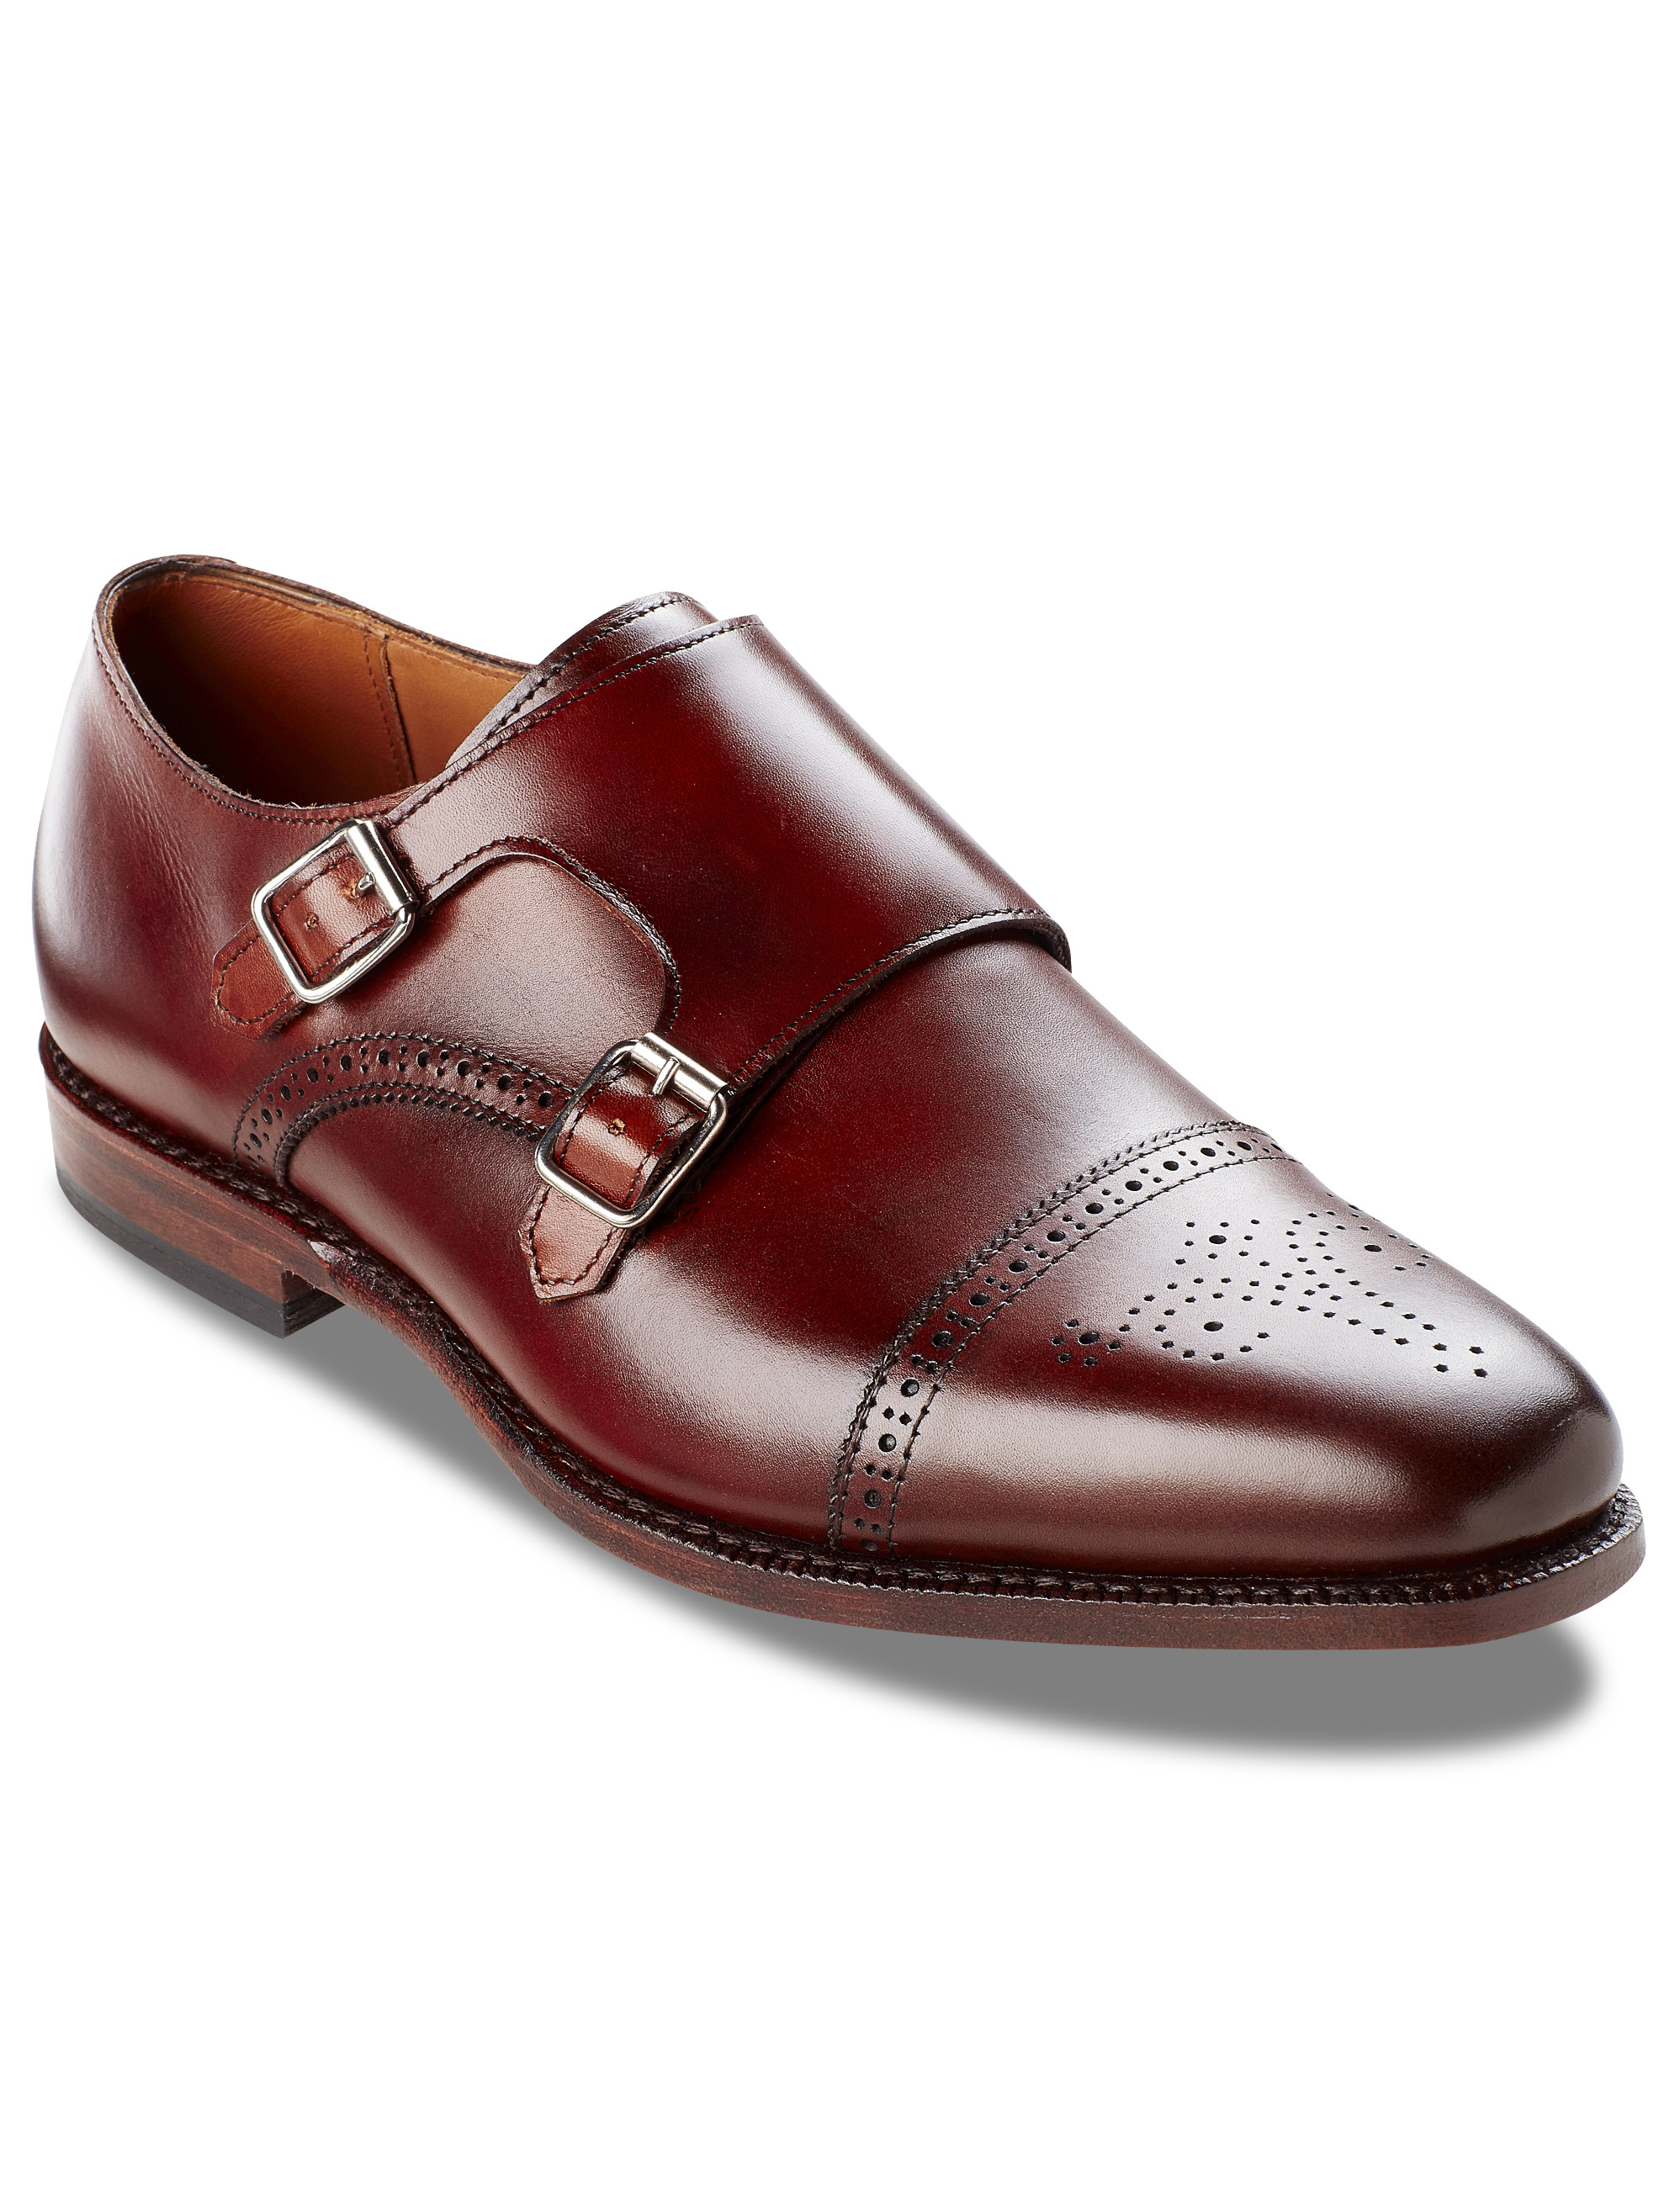 Allen Edmonds St Johns Slip On Dress Shoes